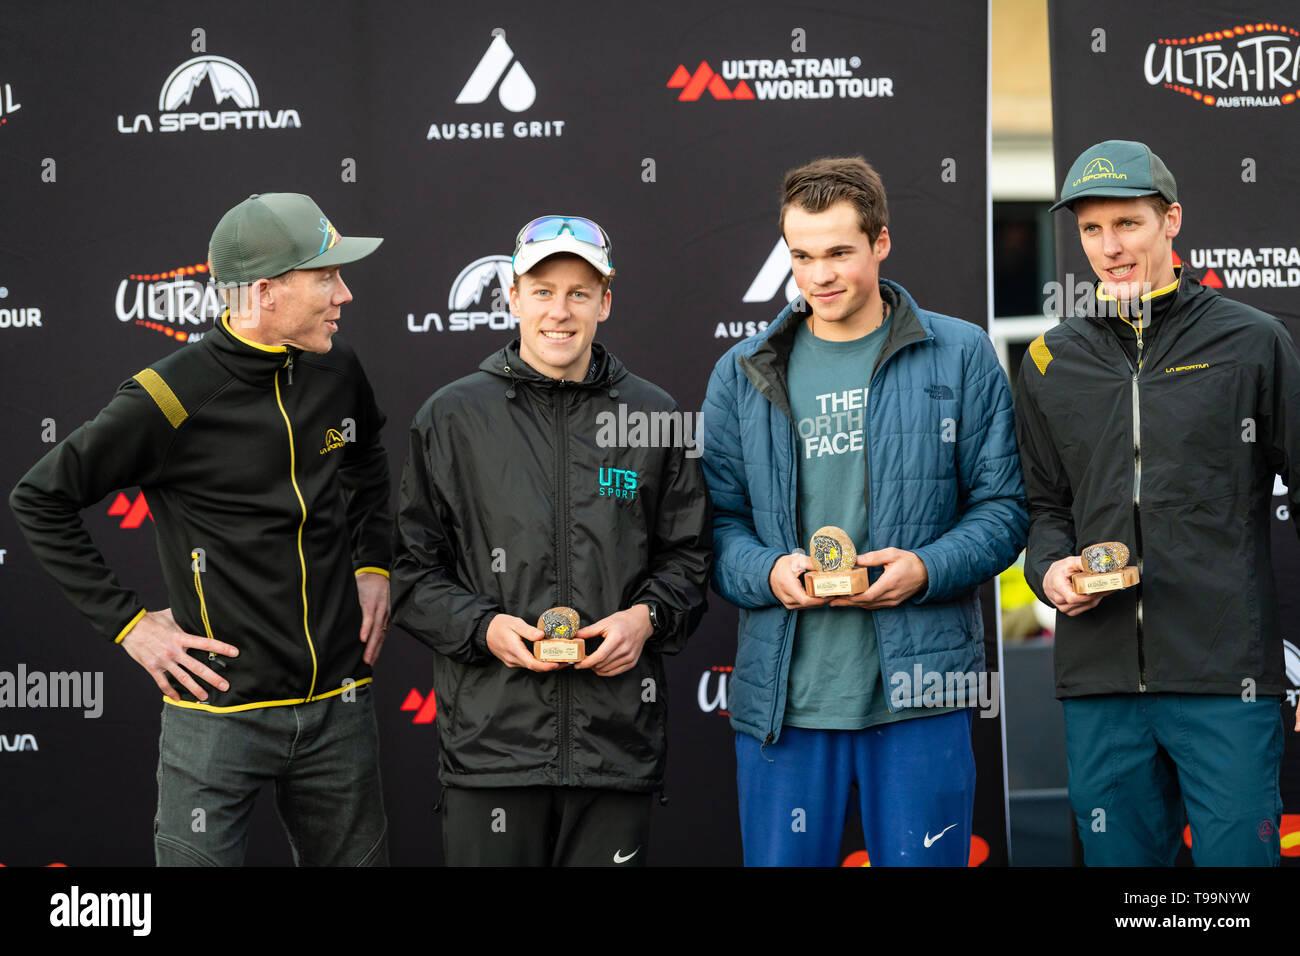 Blue Mountains, Australia - April 16 2019: Ultra-Trail Australia UTA11 race. Over race place getters on podium with sponsor from La Sportiva - Stock Image